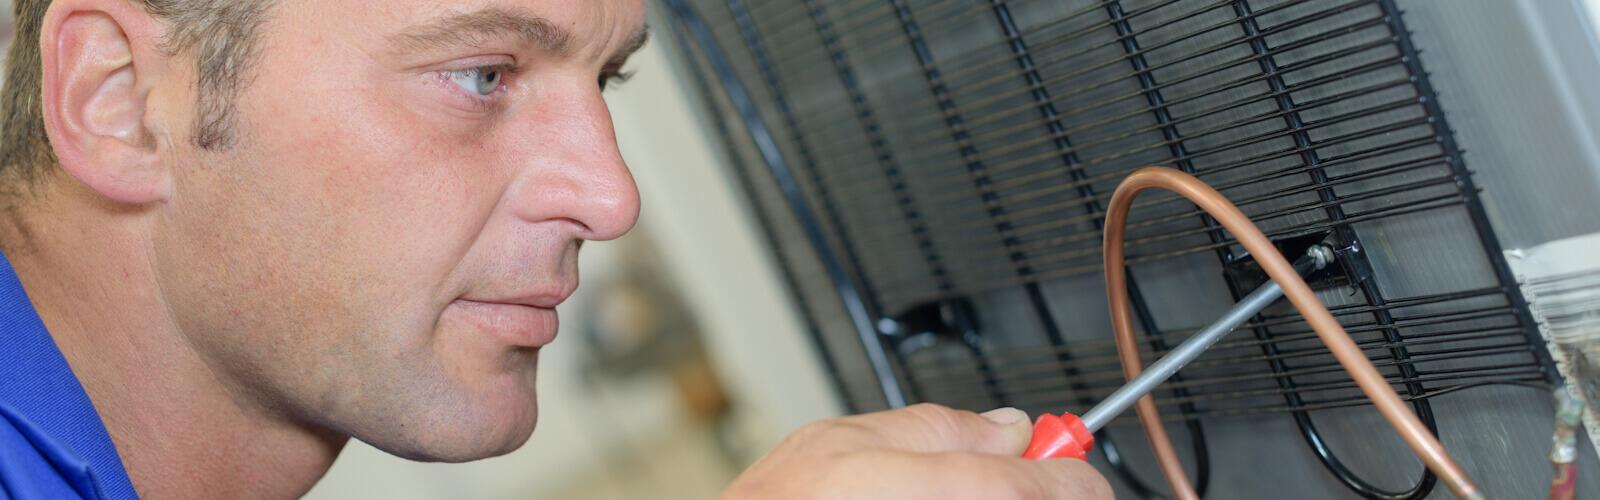 Fridge & Fridge Freezer Repairs